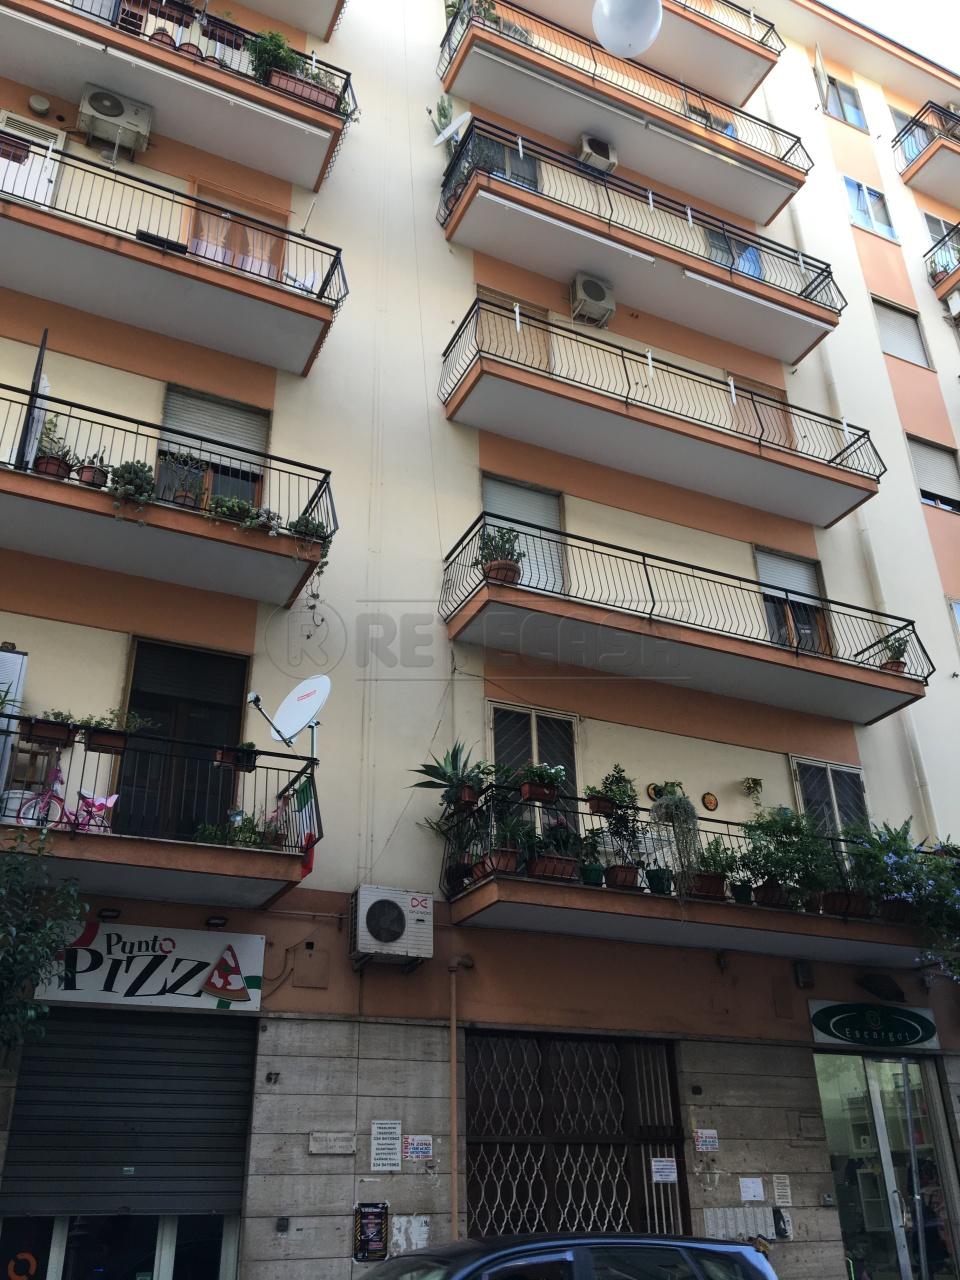 Appartamento, torrione, Vendita - Salerno